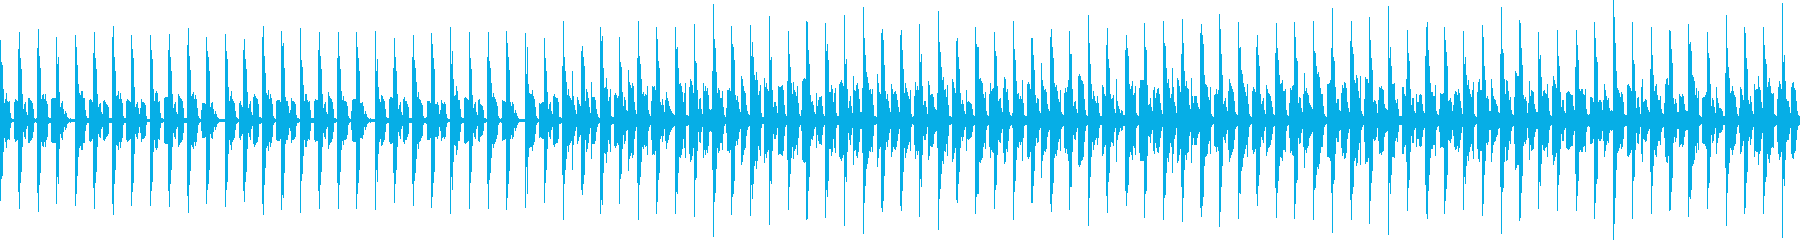 (Loop)マイルドめなエレクトロポップの再生済みの波形